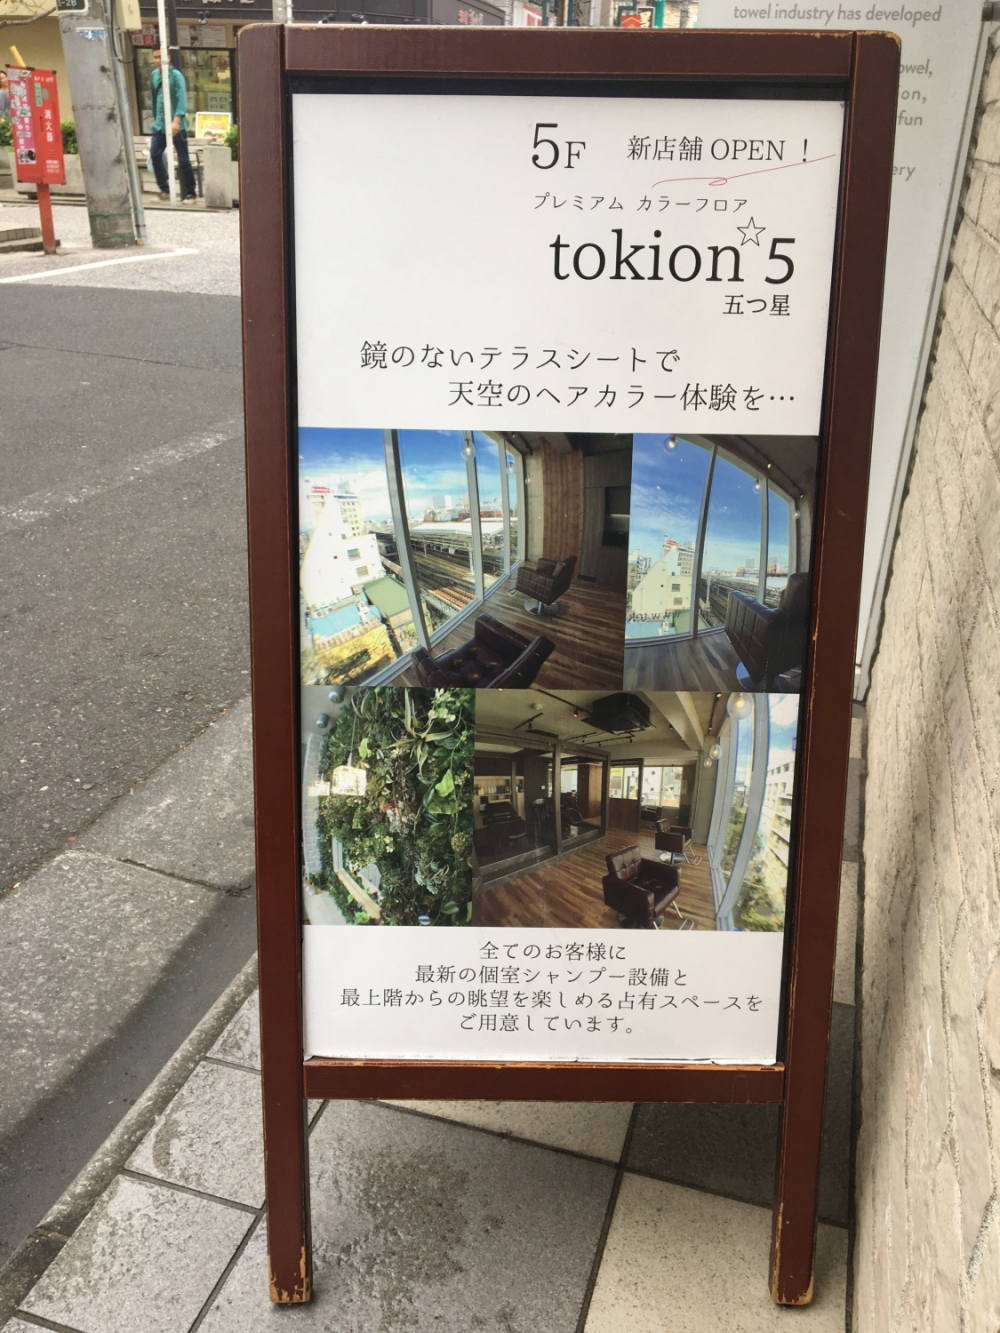 TOKION ☆5(トキオン五つ星)